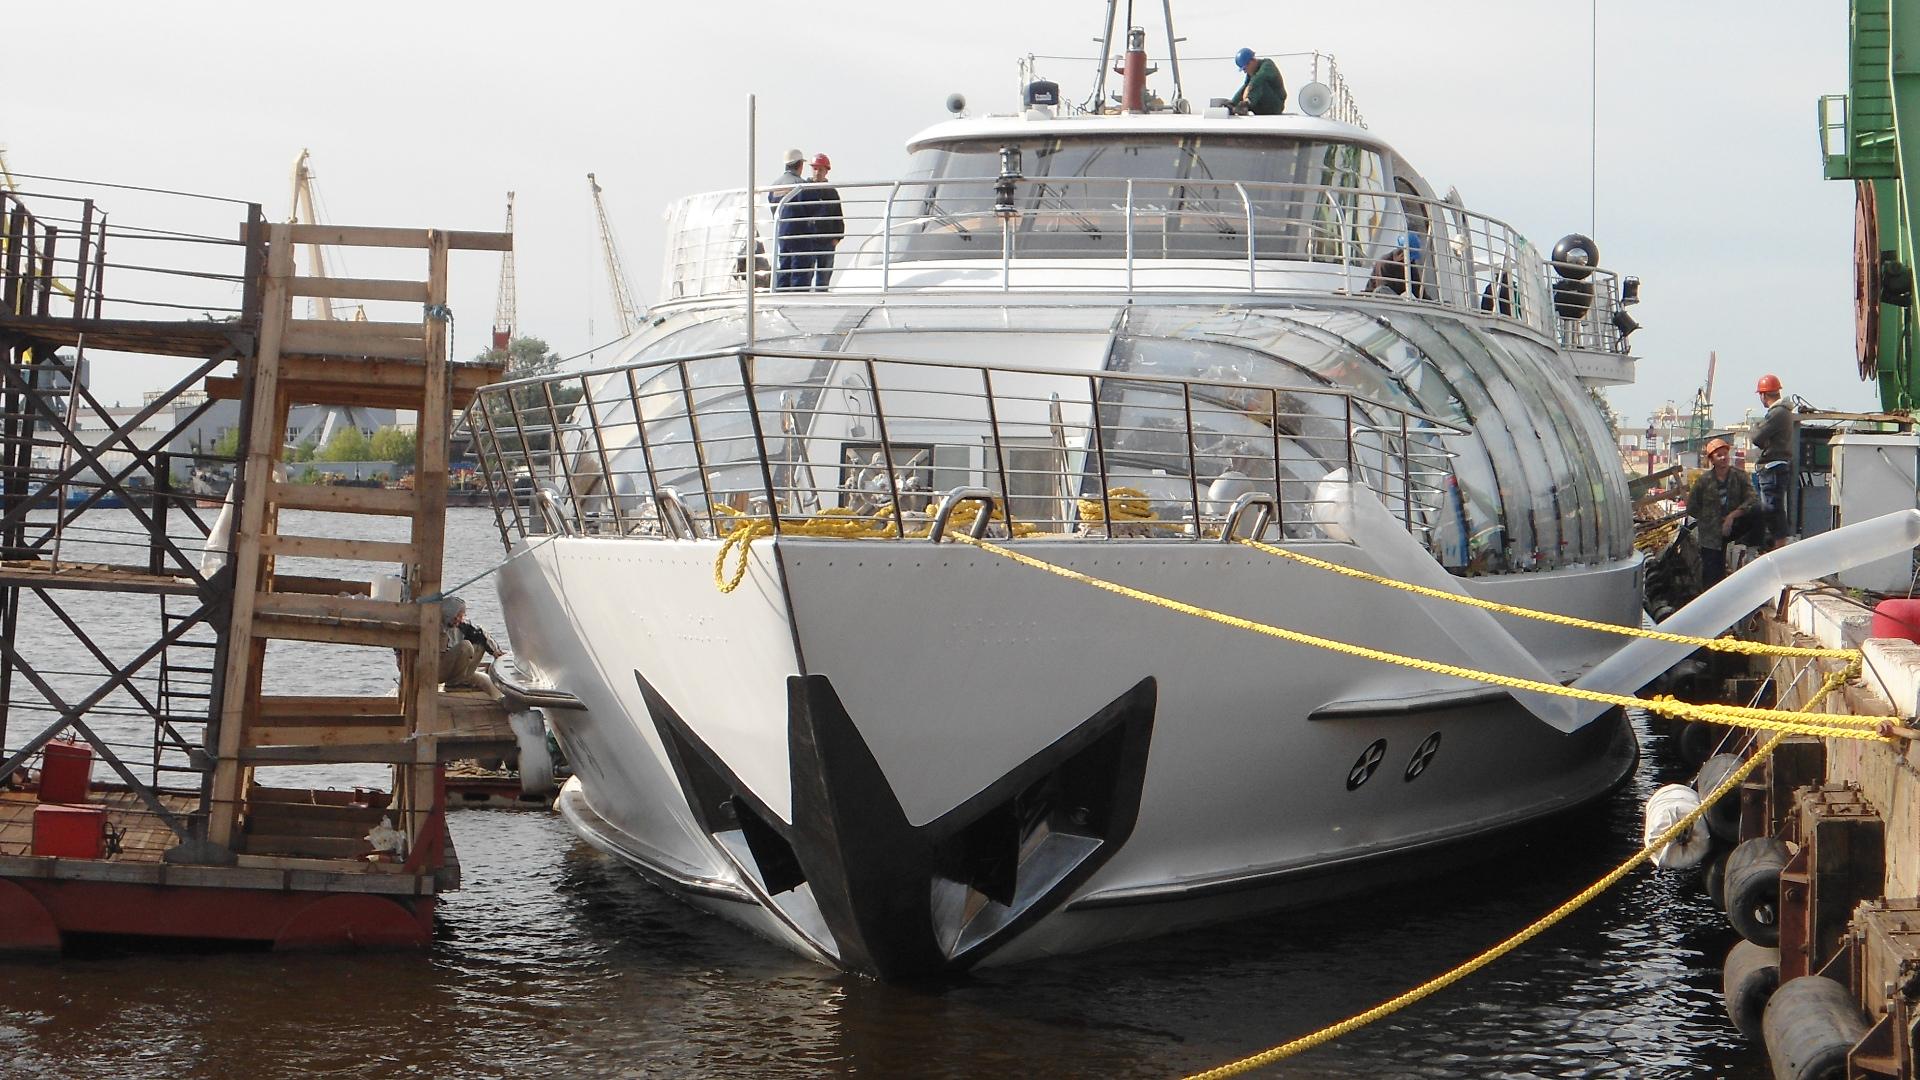 Radisson Royal Flotilla (Super Yachts)